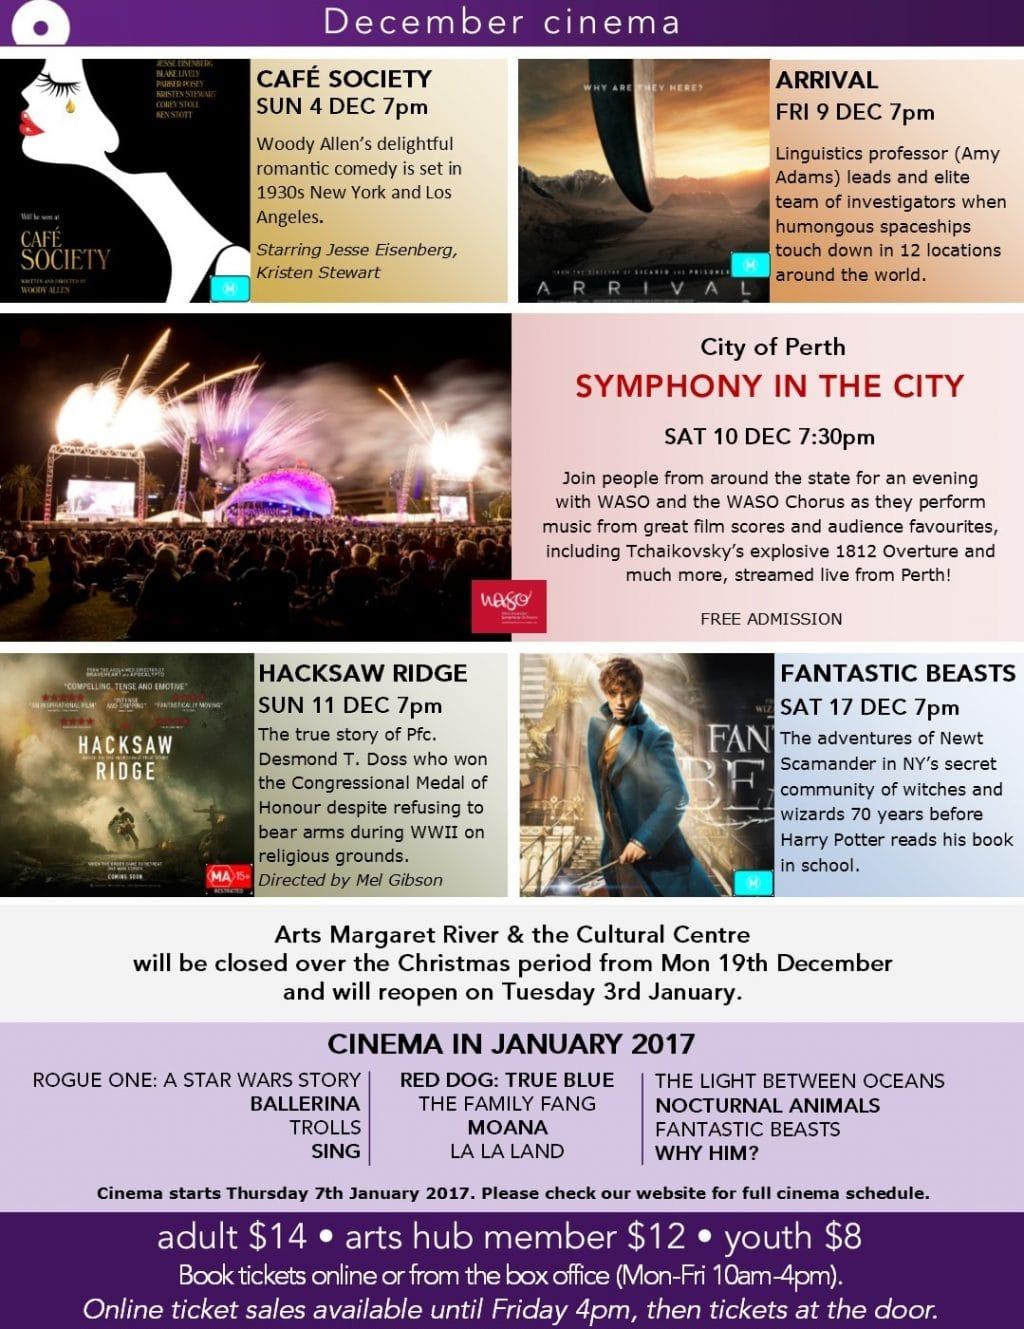 Cinema December 2016